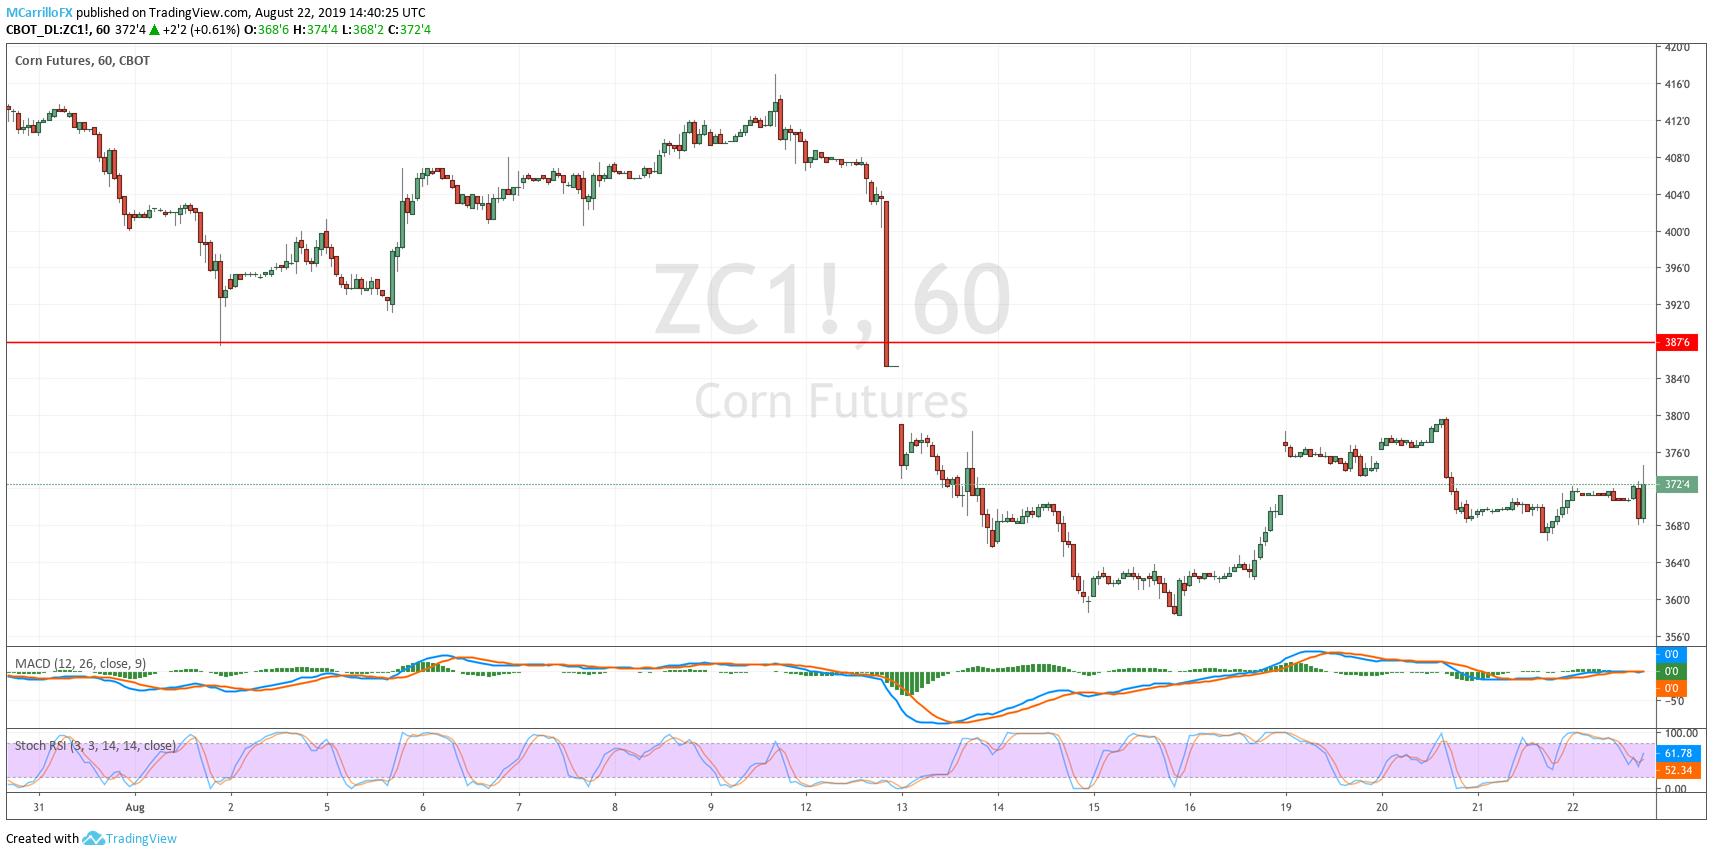 ZC1 Corn Future 1-hour chart August 22